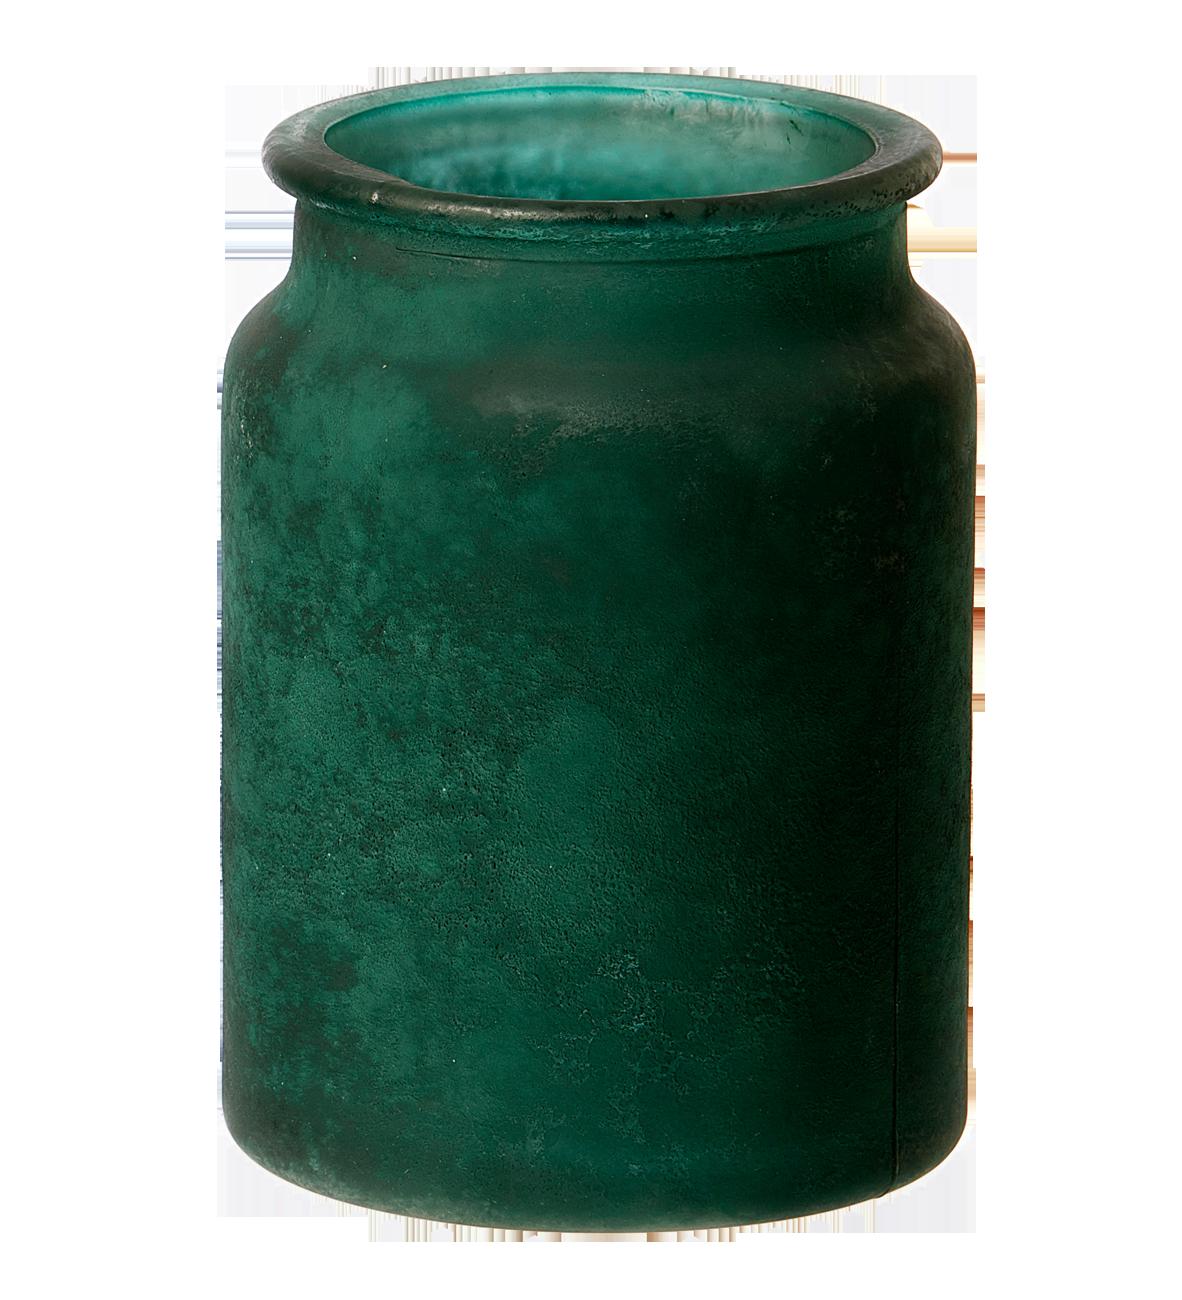 Palma vase, genbrugsglas. Grøn